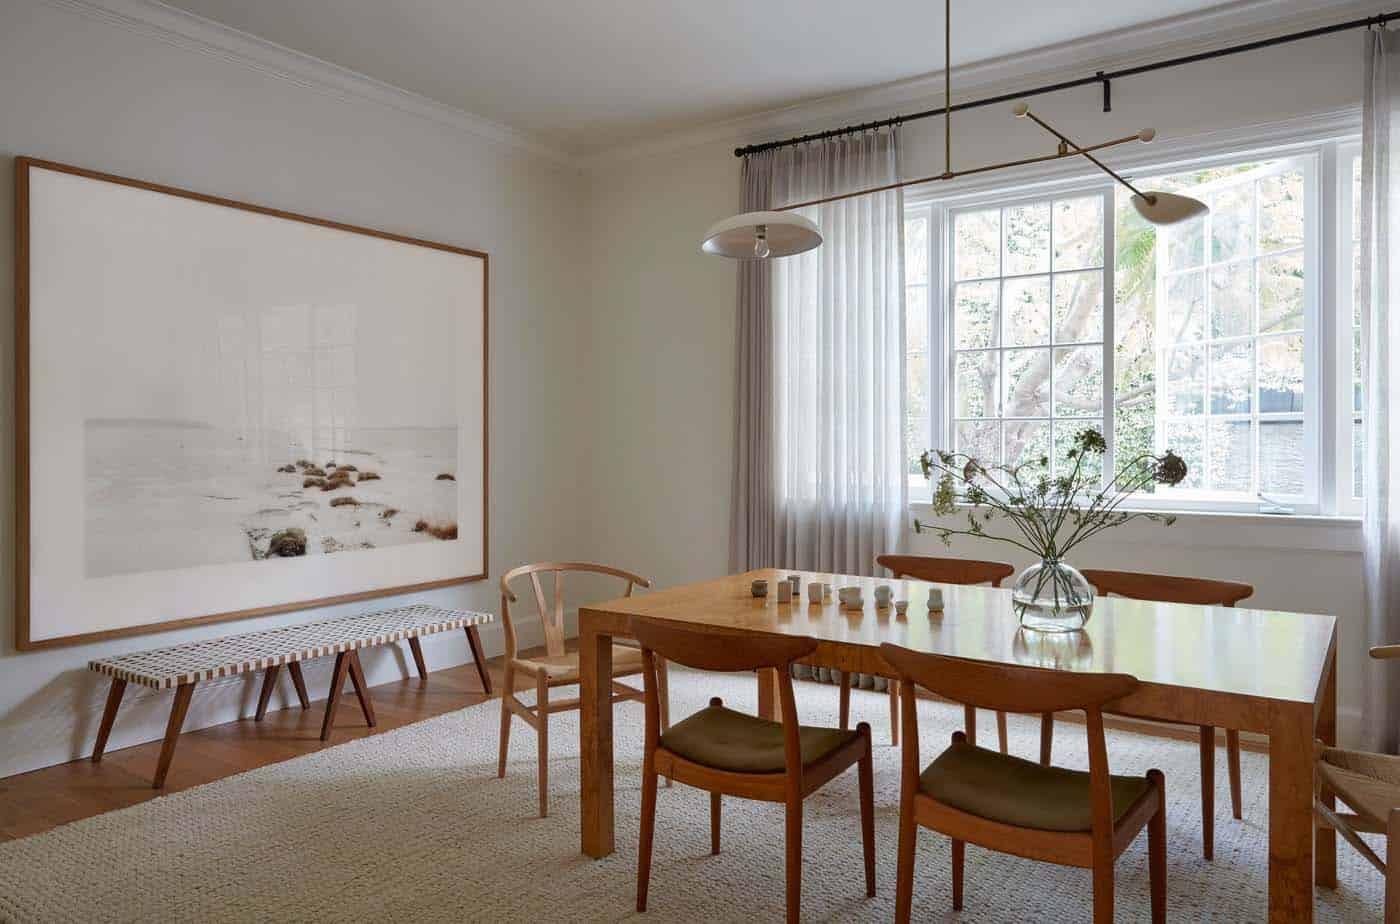 Historic Farmhouse Renovation-Ken Linsteadt Architects-09-1 Kindesign